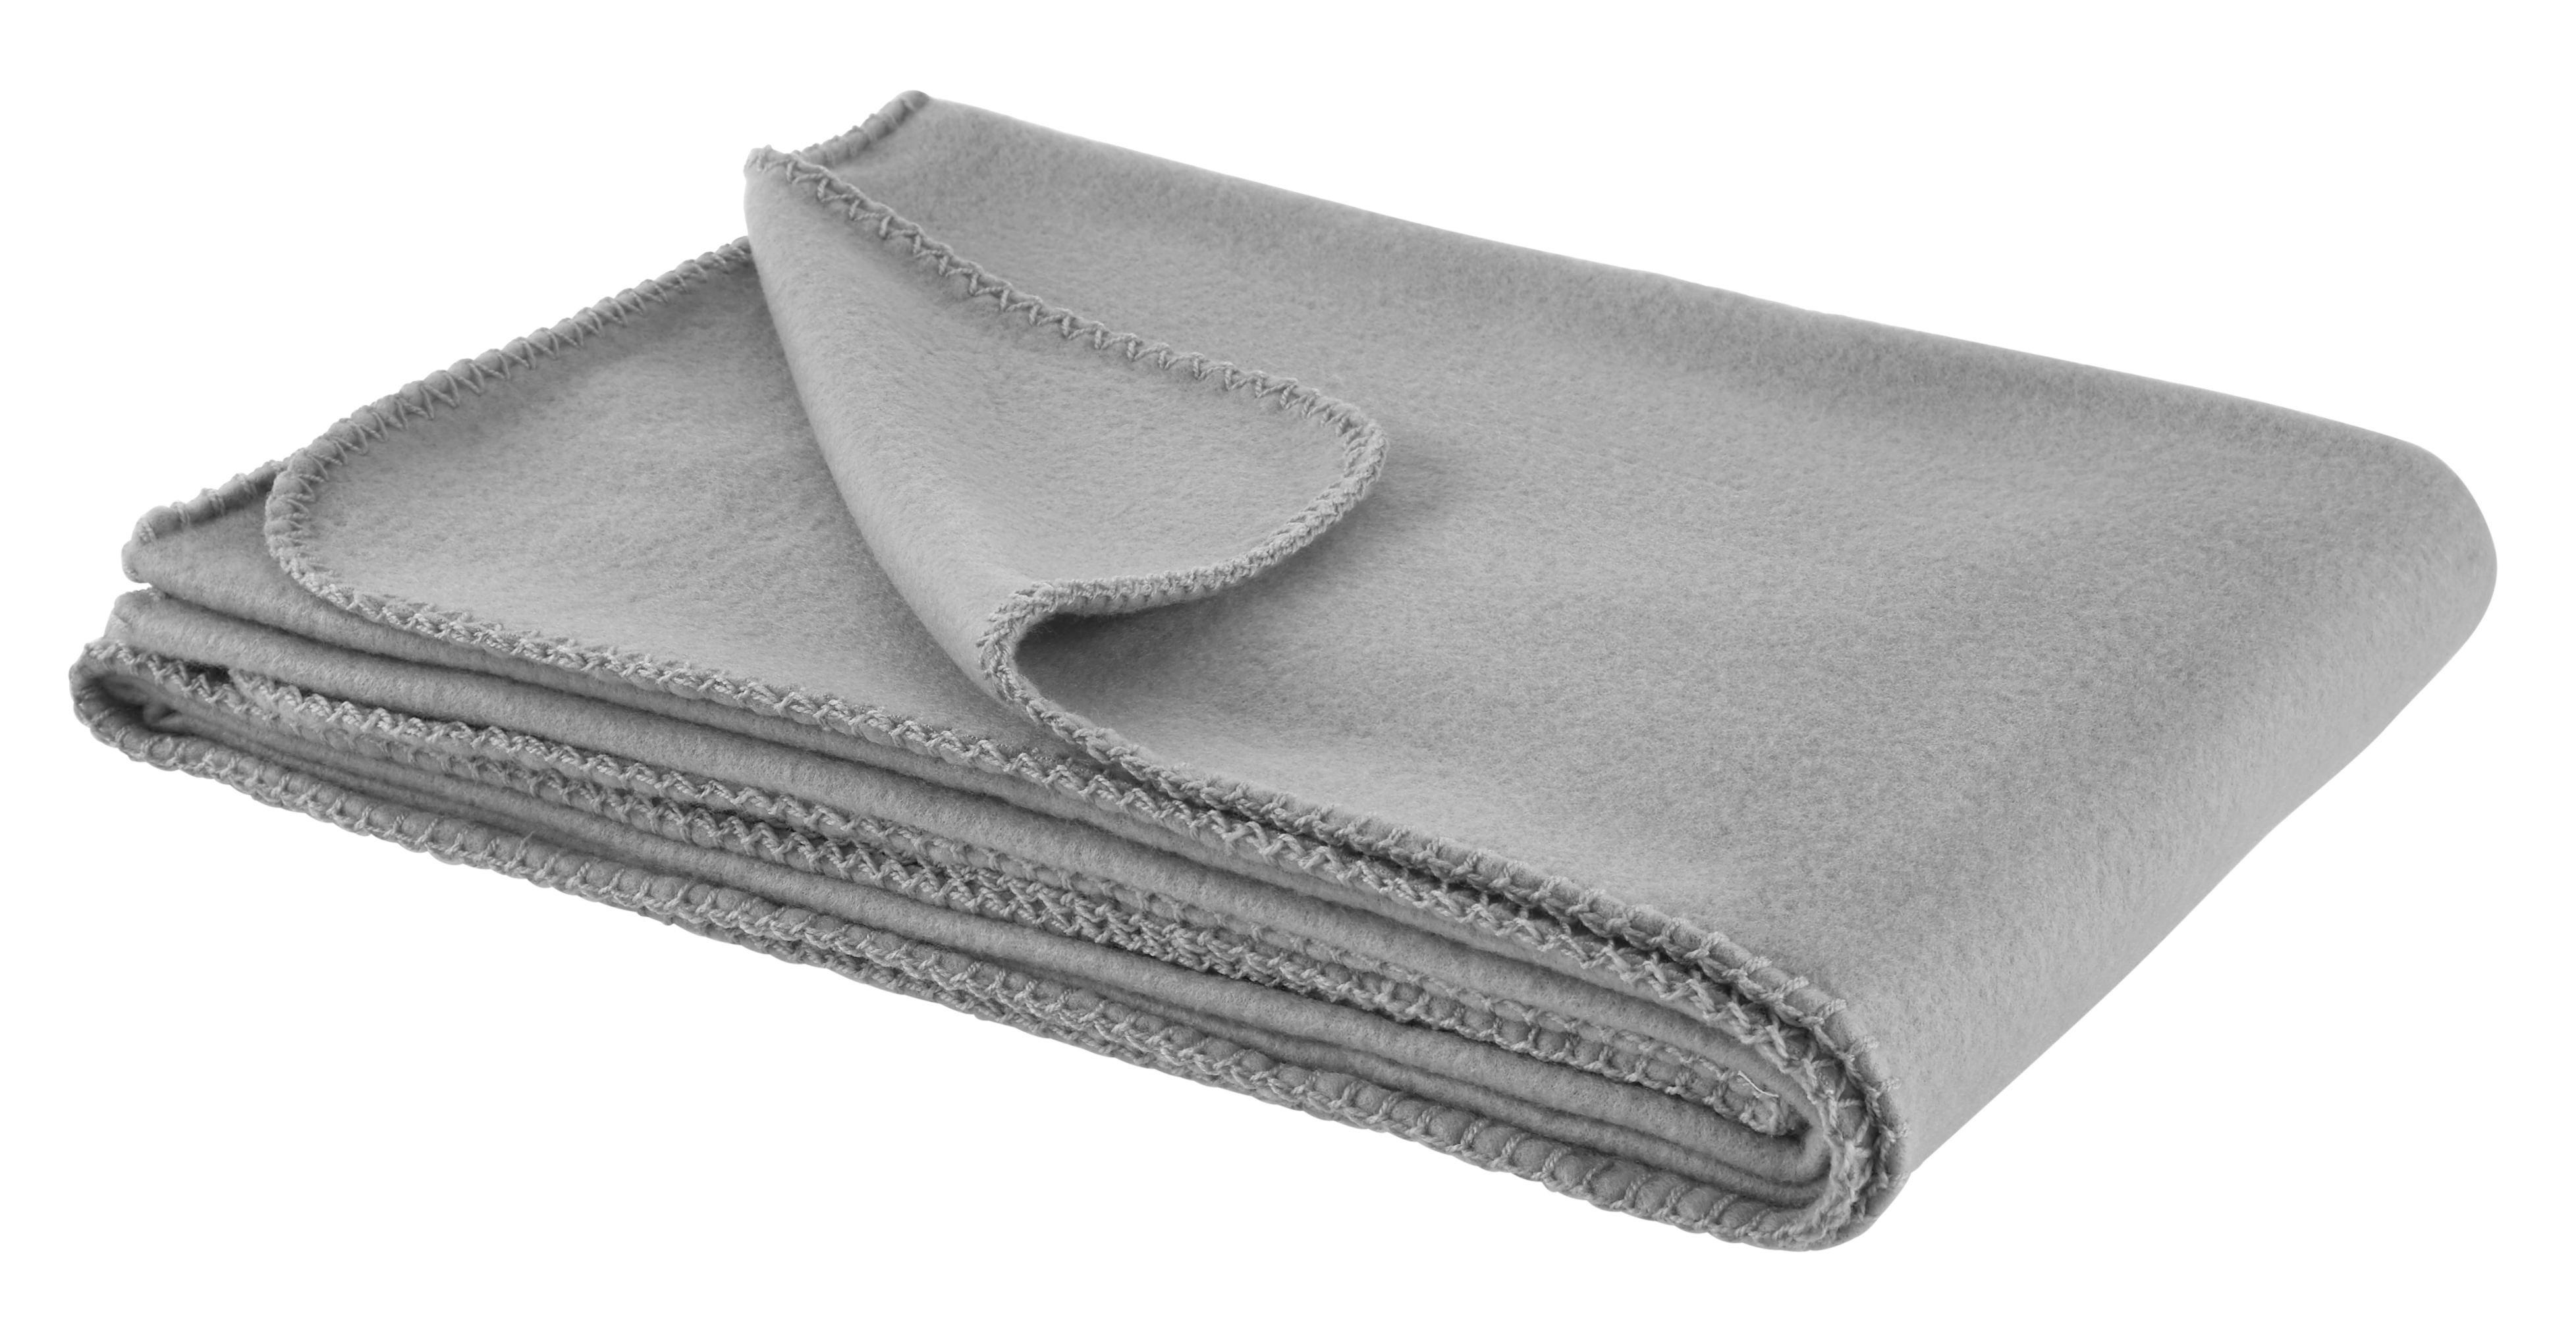 Fleecedecke Anni 130x170cm - Hellgrau, KONVENTIONELL, Textil (130/170cm) - MÖMAX modern living